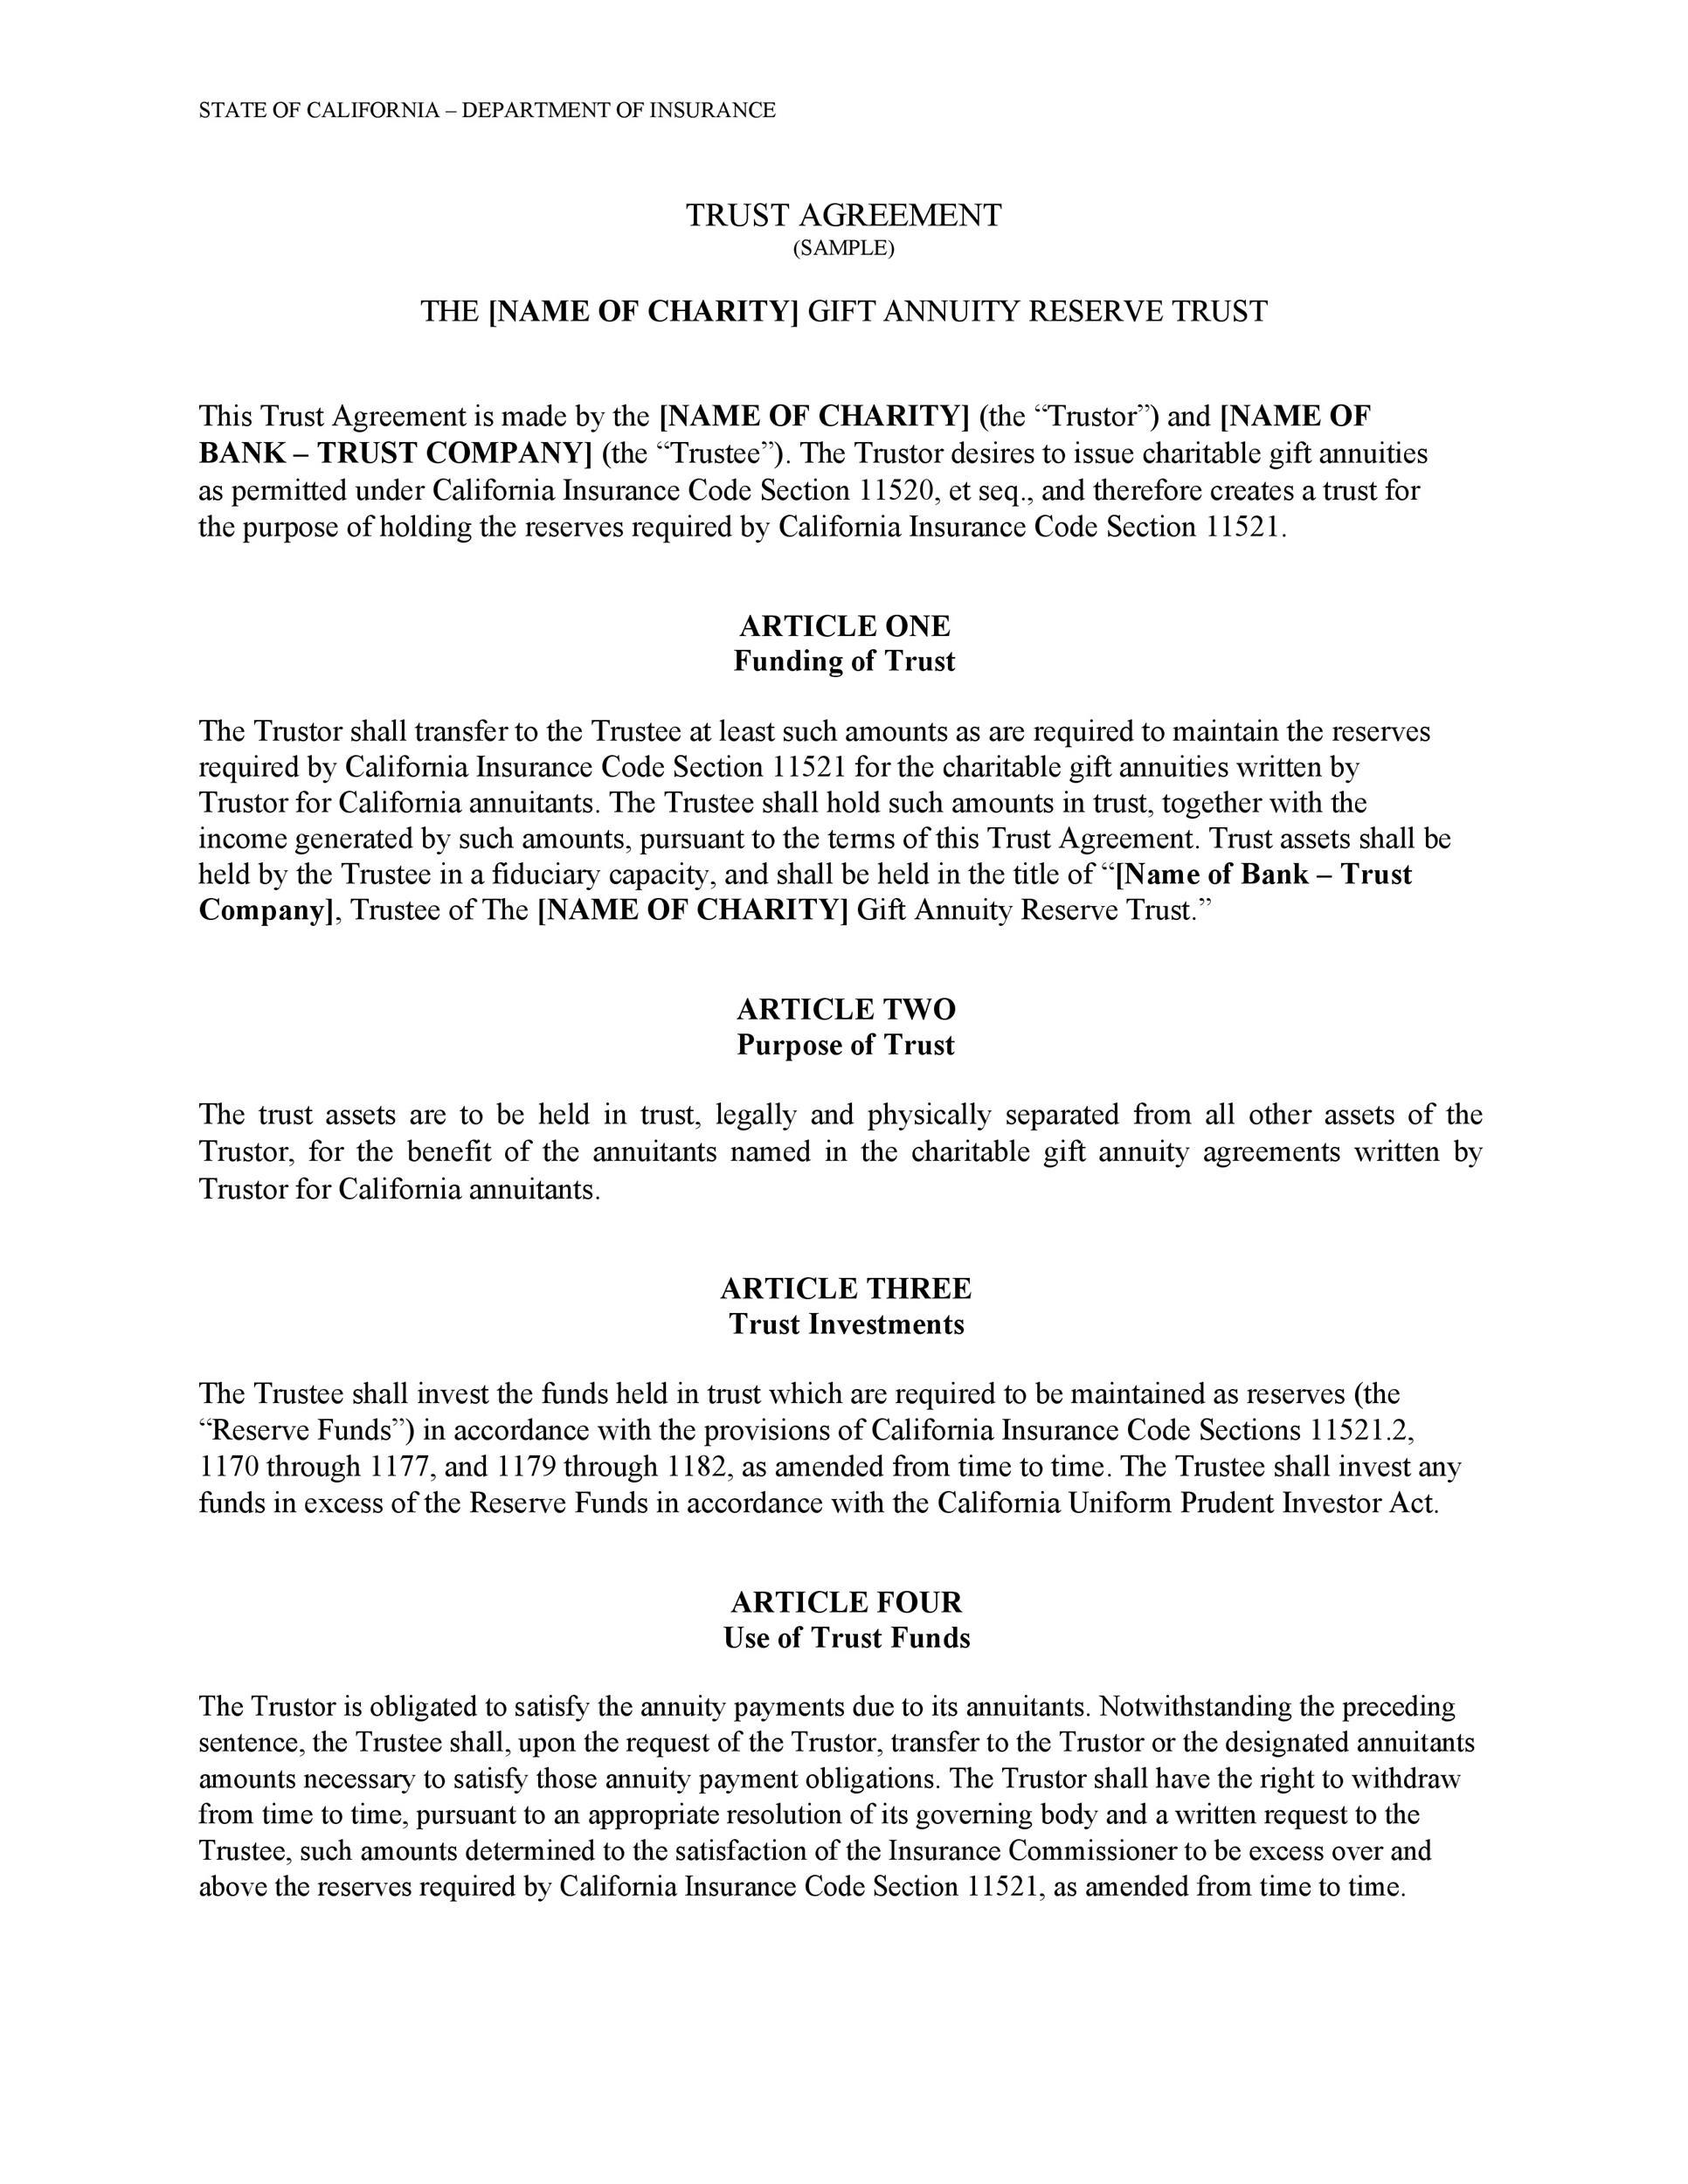 Free trust agreement 21